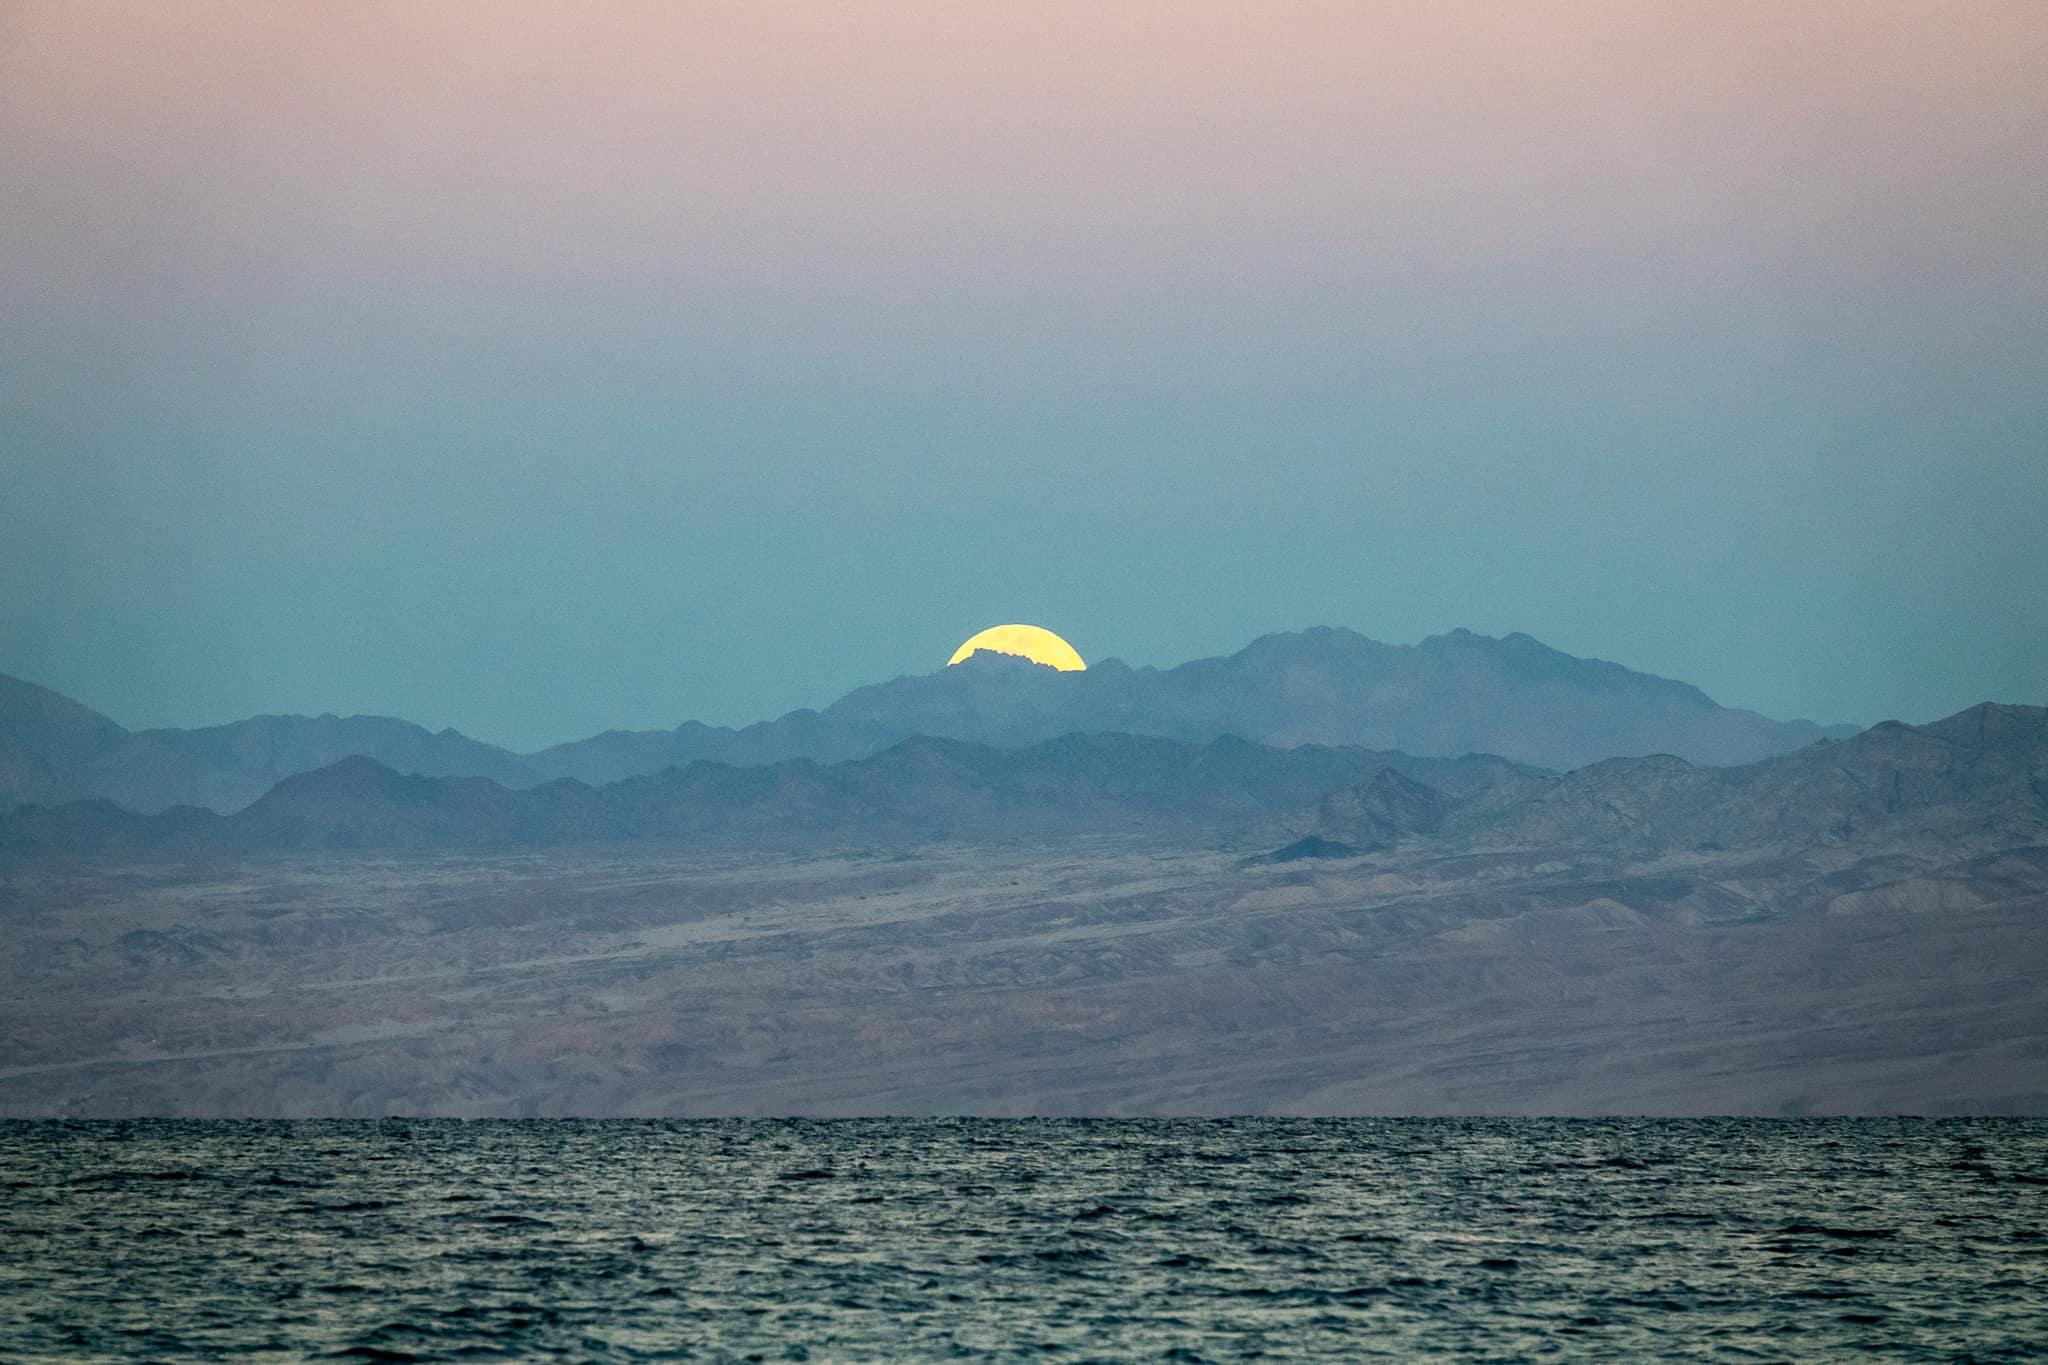 The Supermoon setting over Saudi Arabia, as seen from the Sinai peninsula in egypt